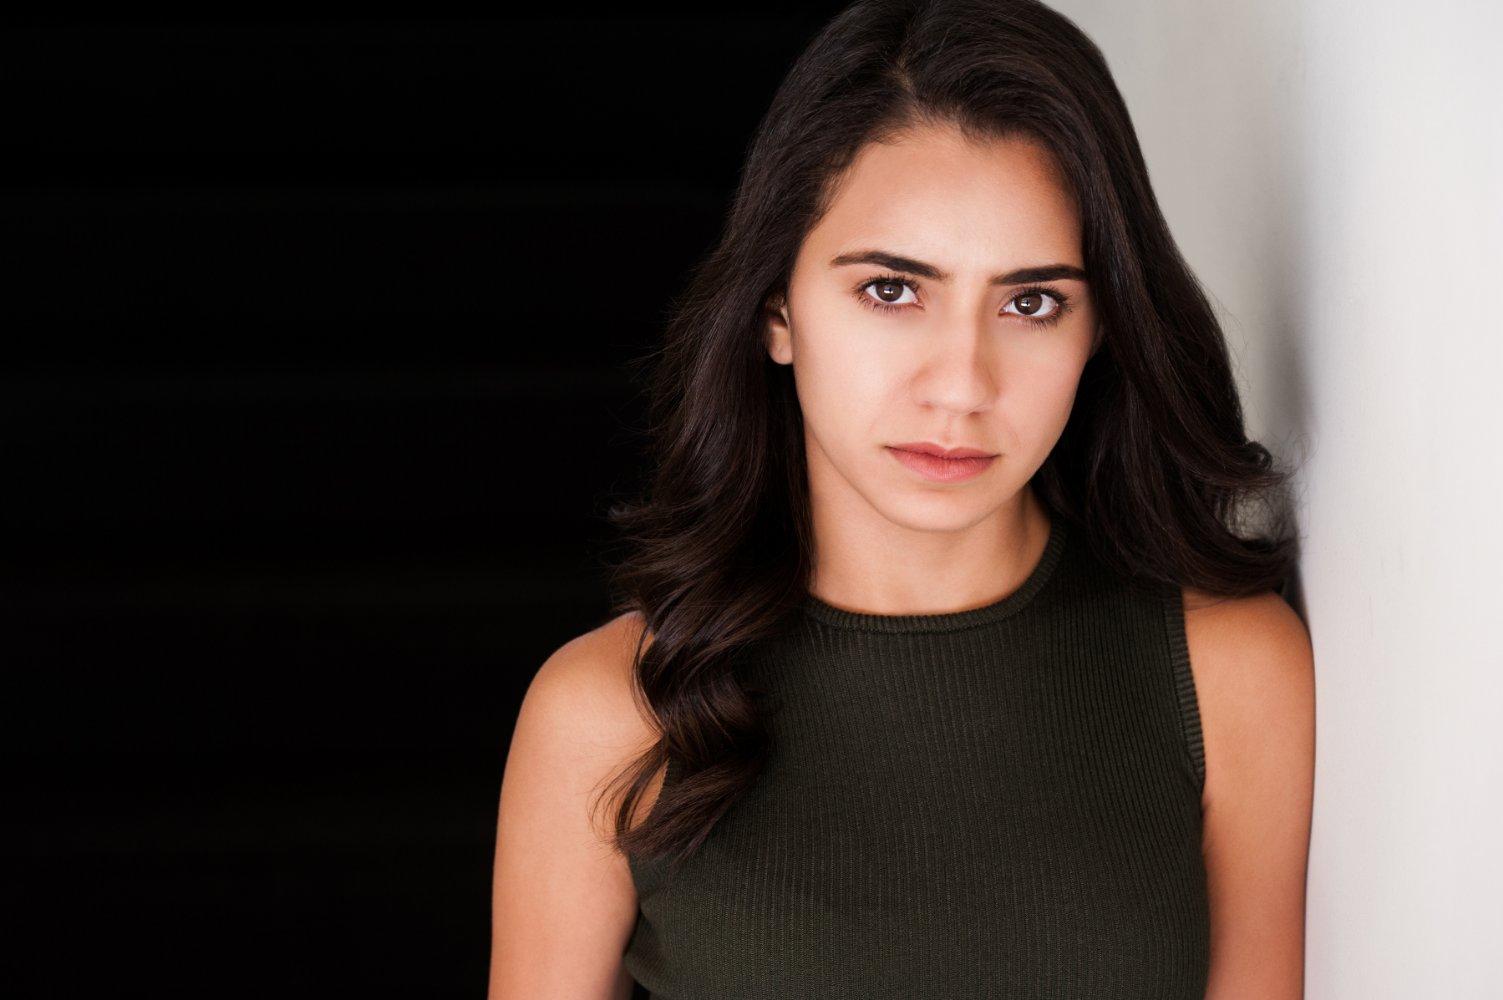 Marla Martinez